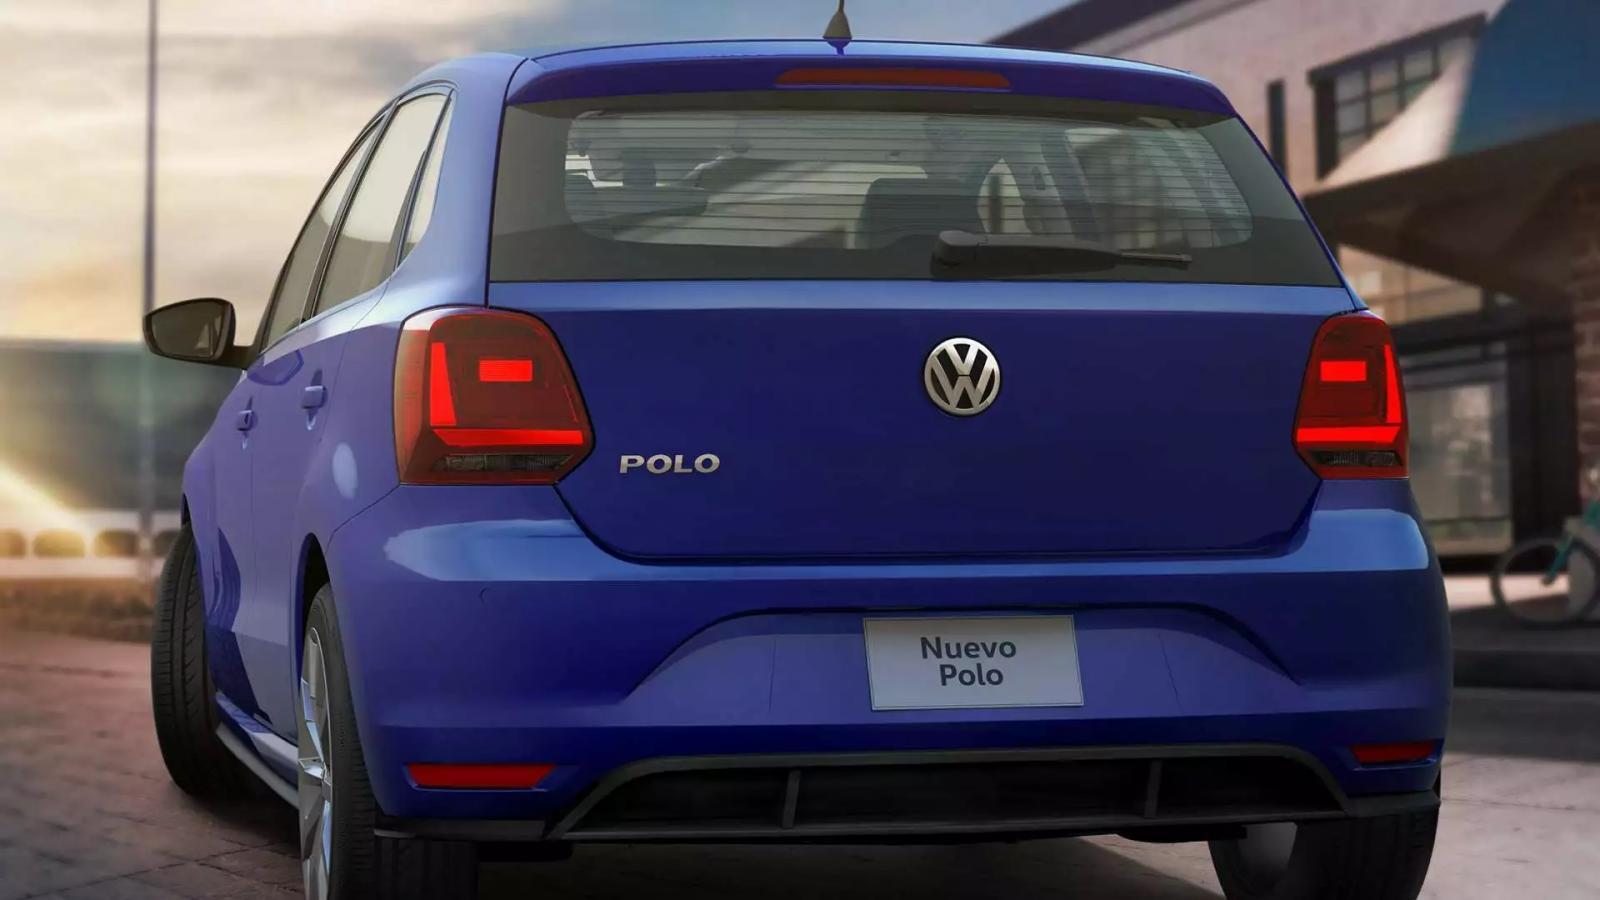 Volkswagen Polo 2020 Resena Con Un Diseno Juvenil